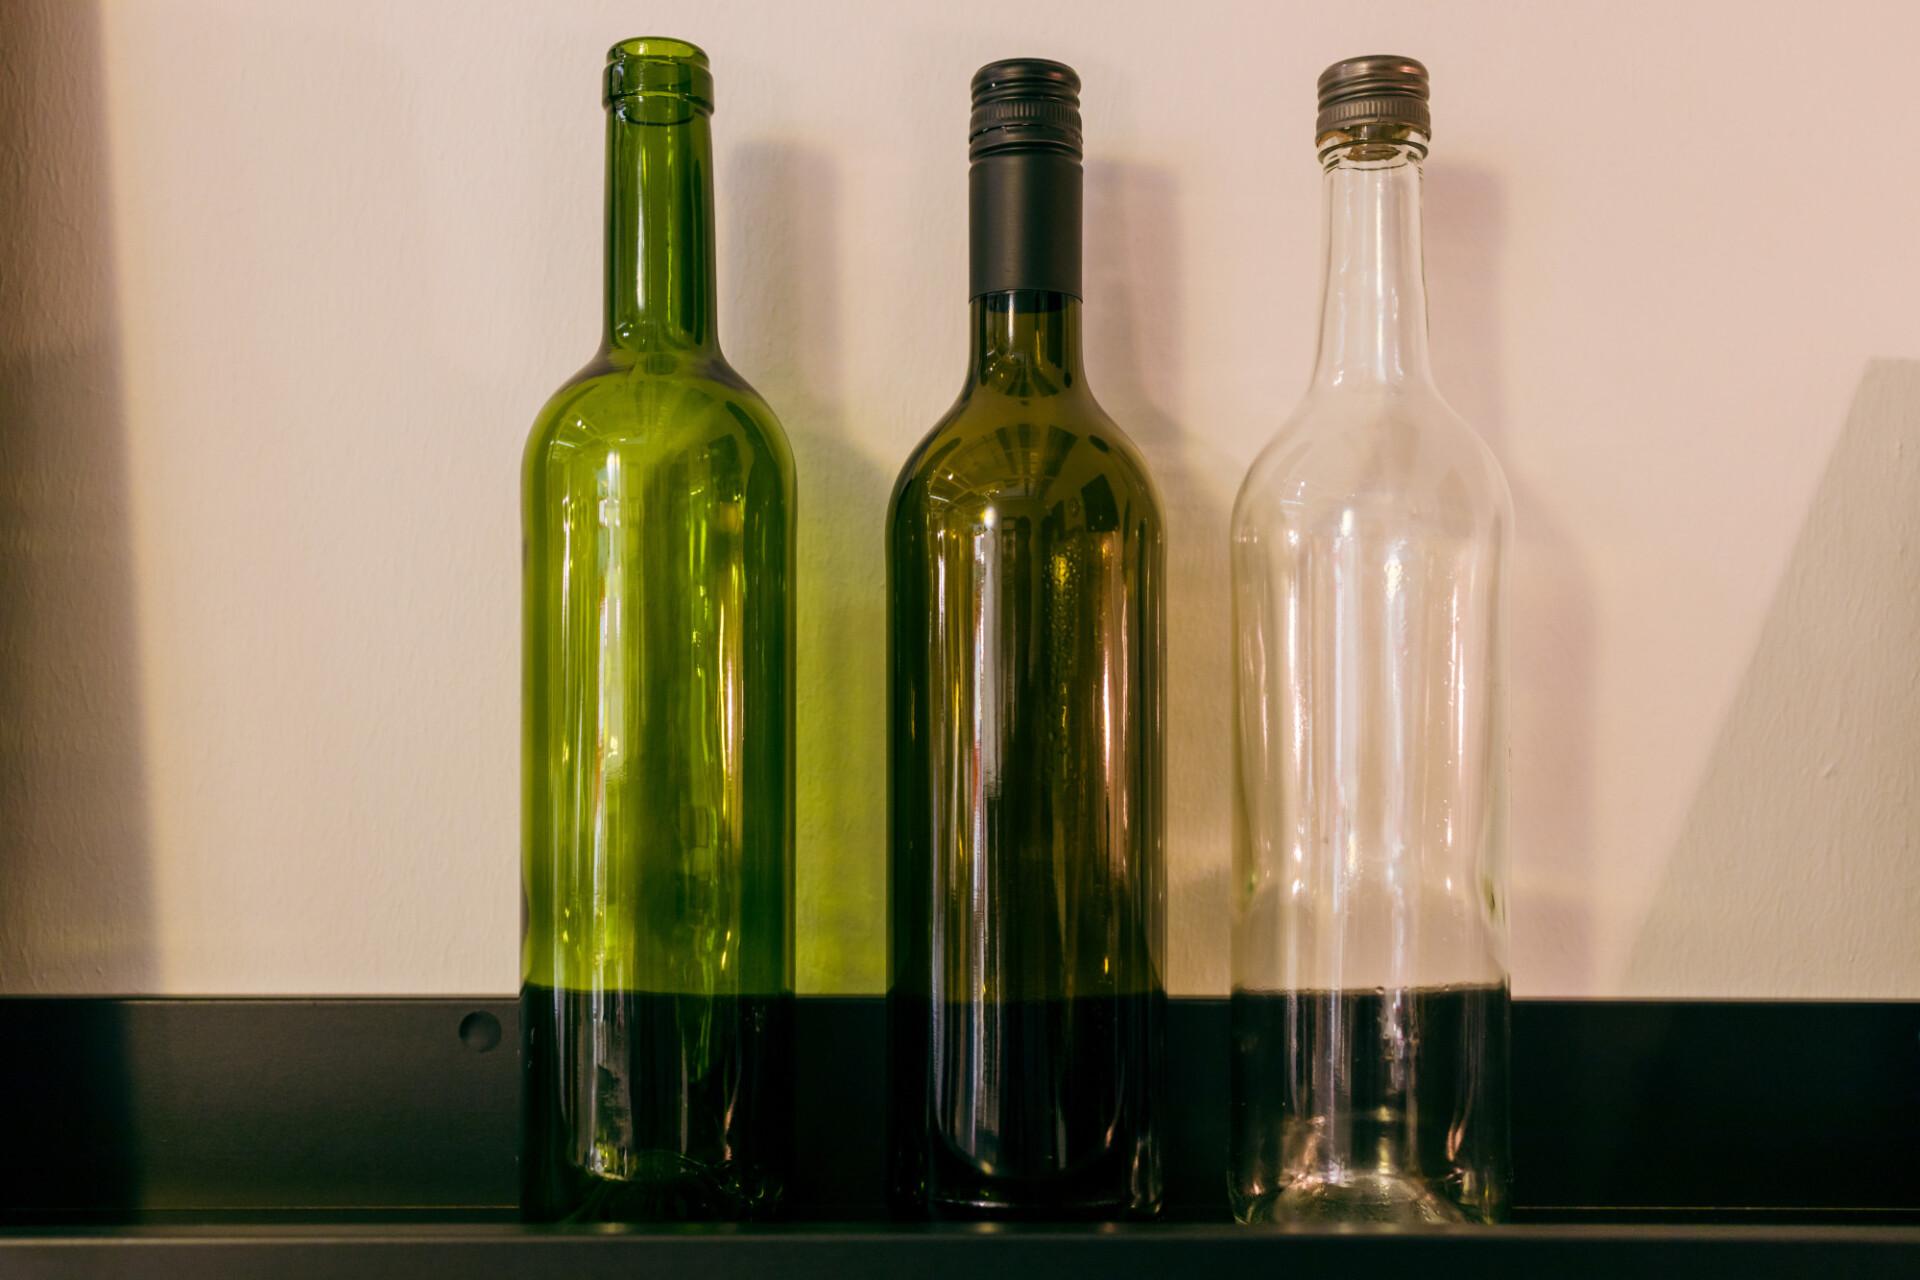 Empty wine bottles in three different shades